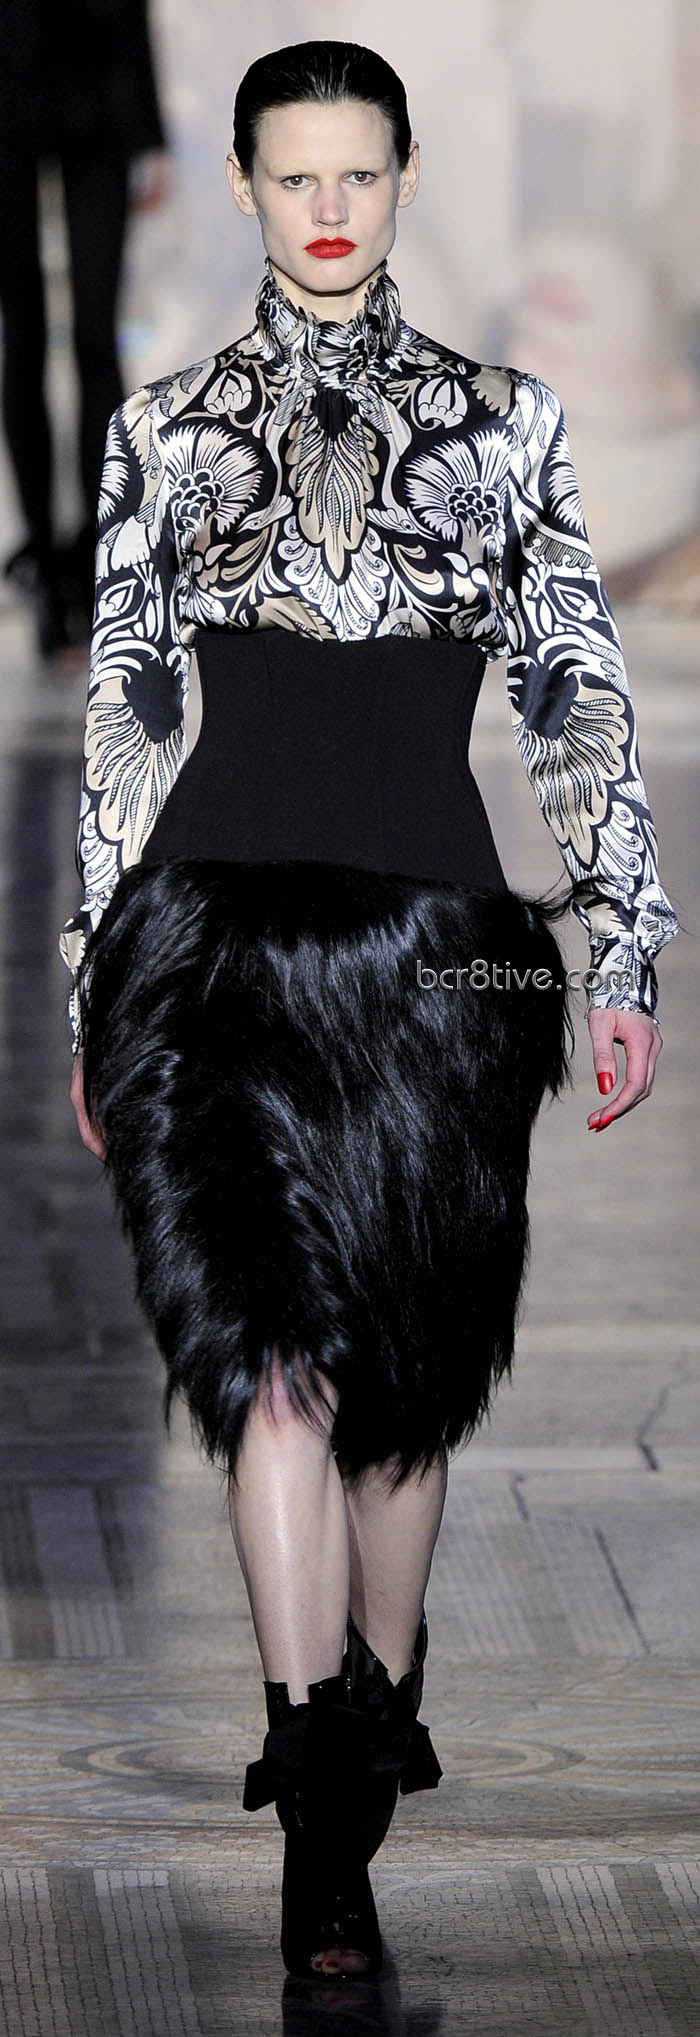 Giles Fall Winter 2011 Ready to Wear